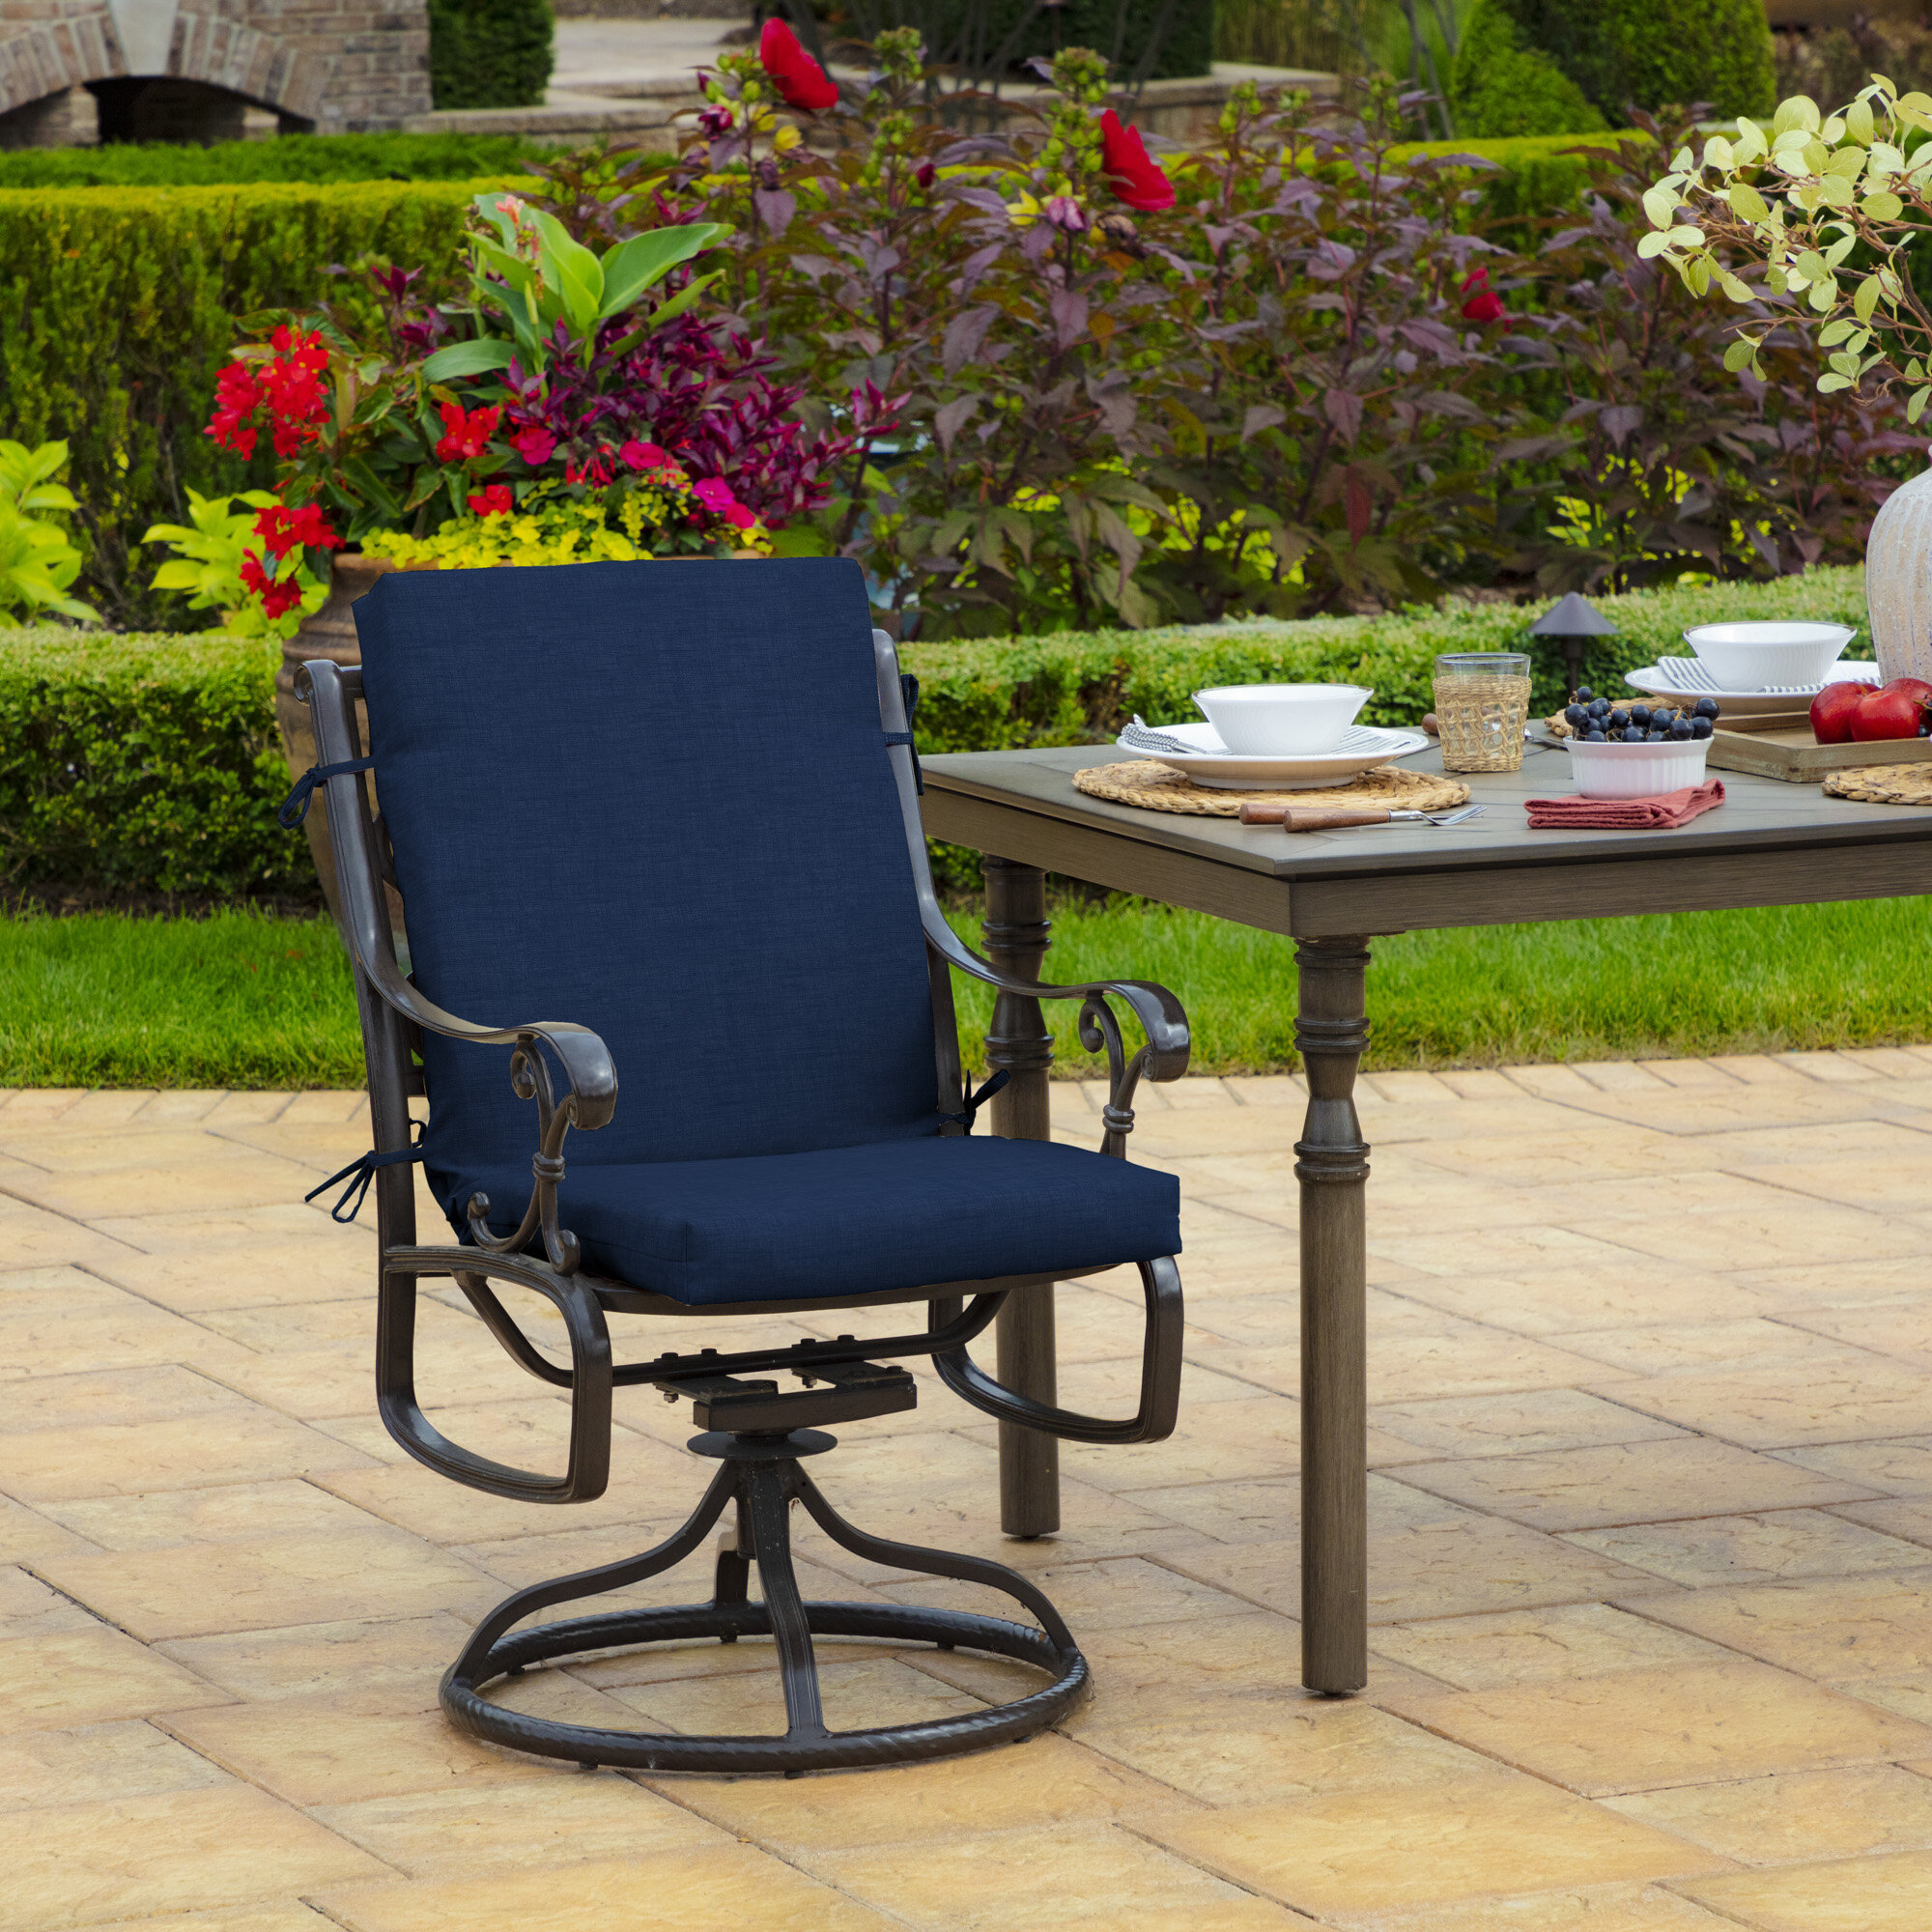 Wayfair Dining Chair Patio Furniture Cushions You Ll Love In 2021